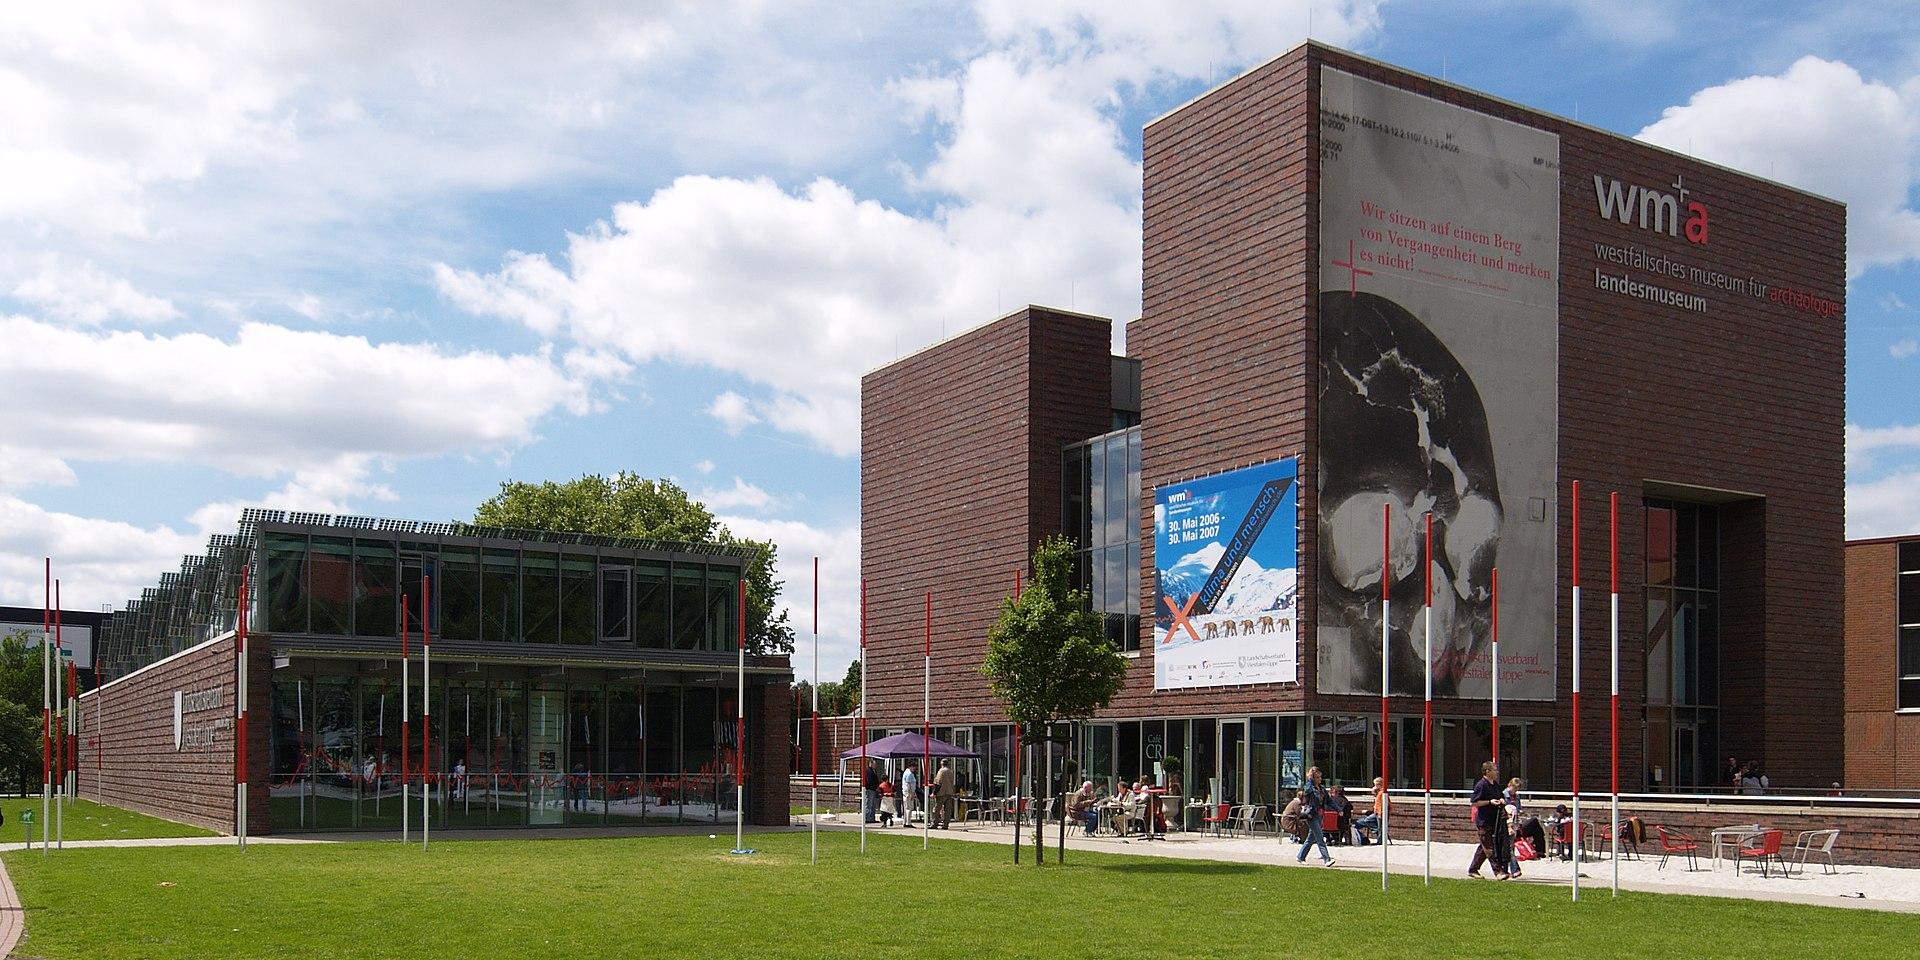 LWL Museum Fr Archologie Wikipedia